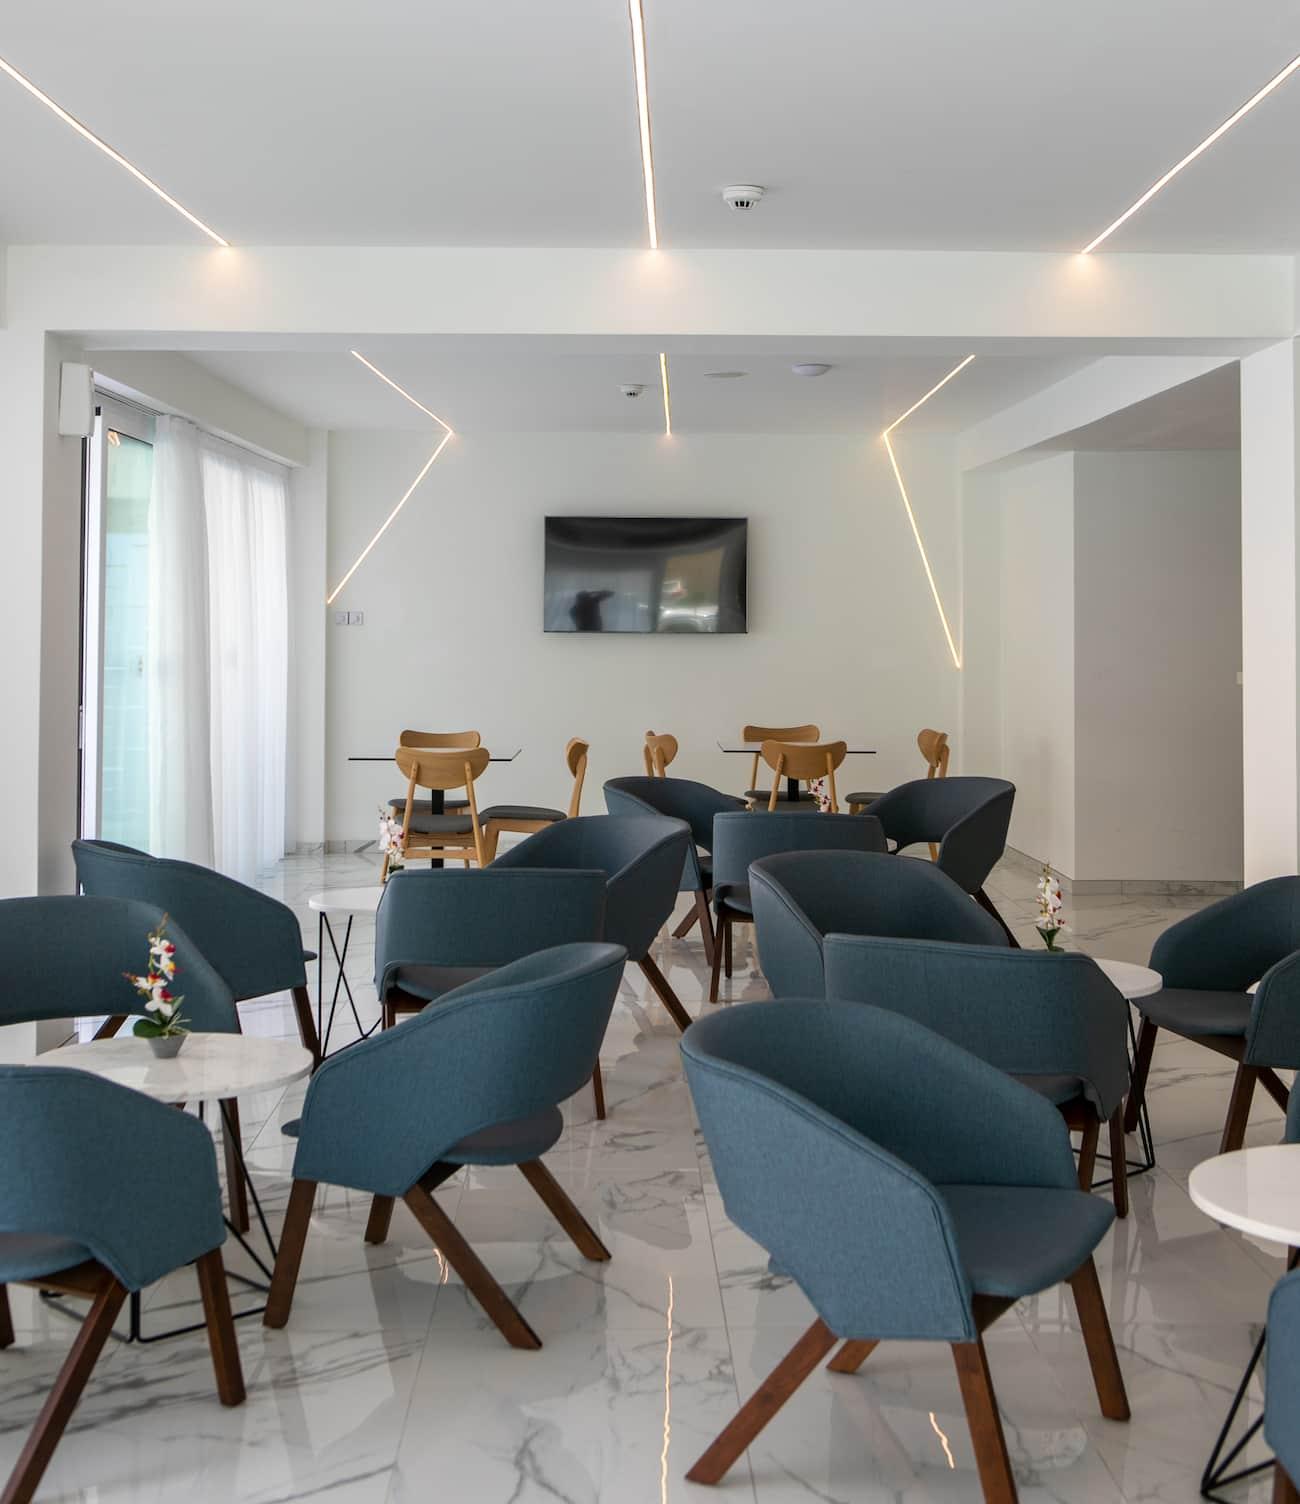 Hotel - renovation - lobby and pool bar